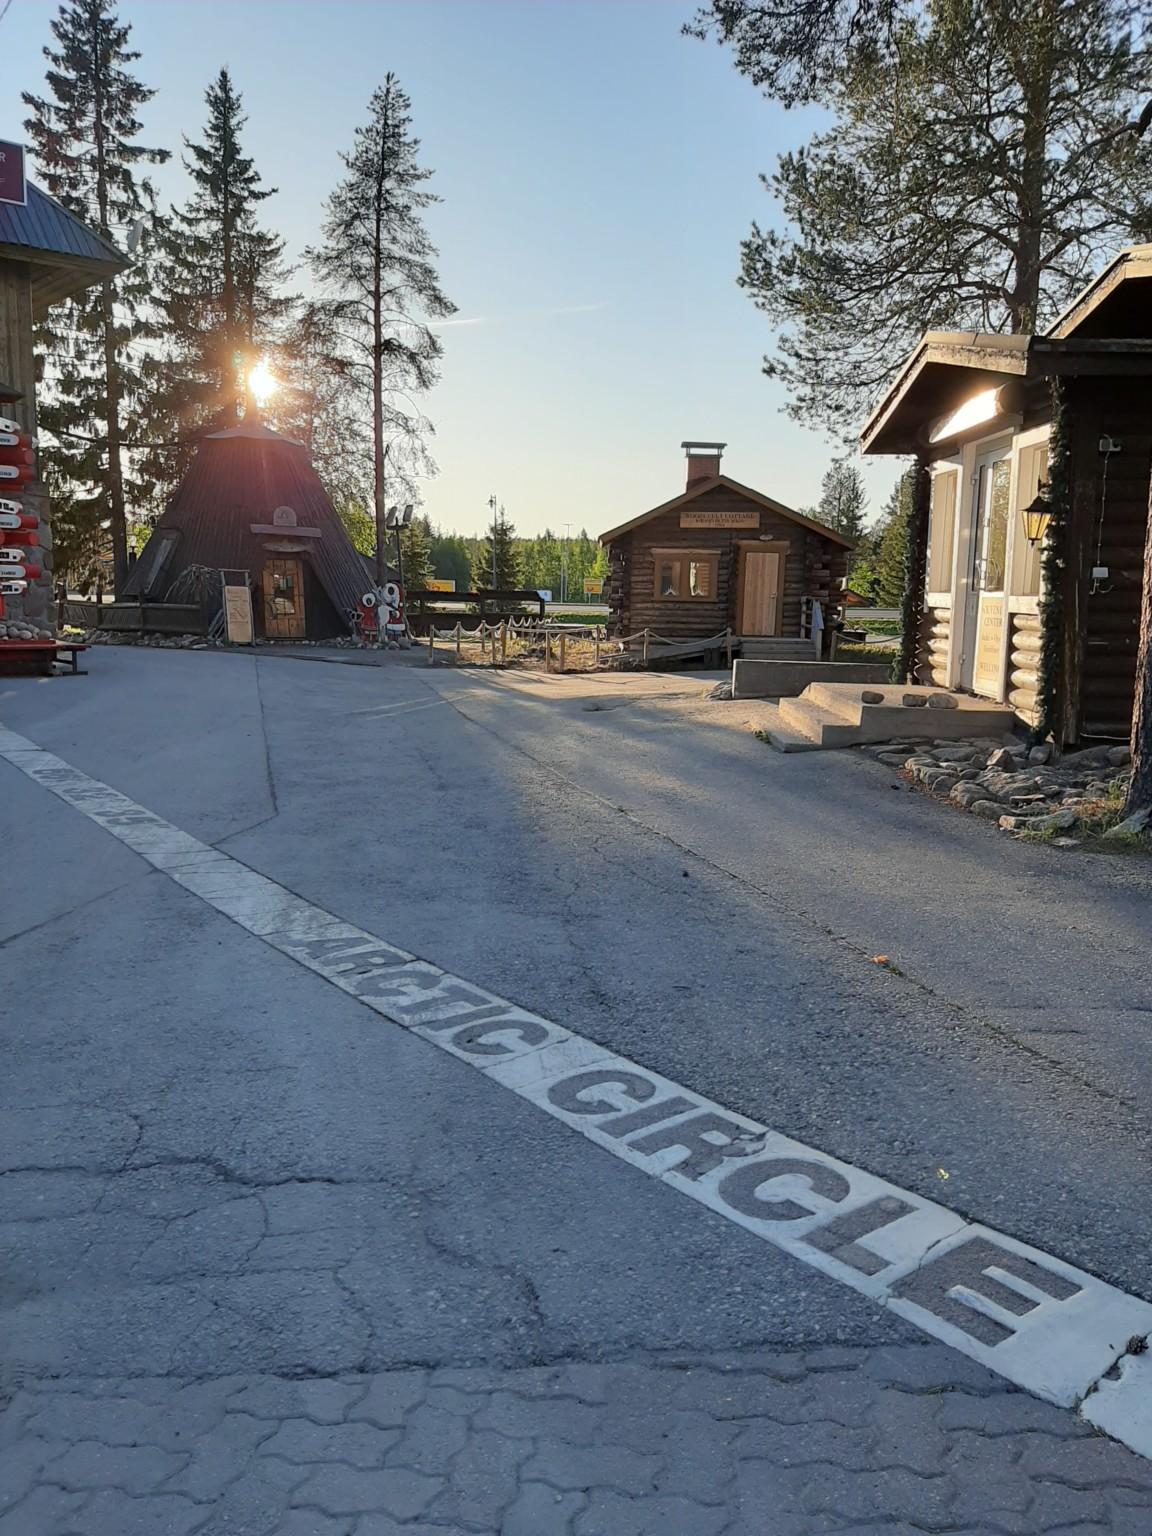 Roosevelt cabin at the arctic circle Rovaniemi Lapland Finland